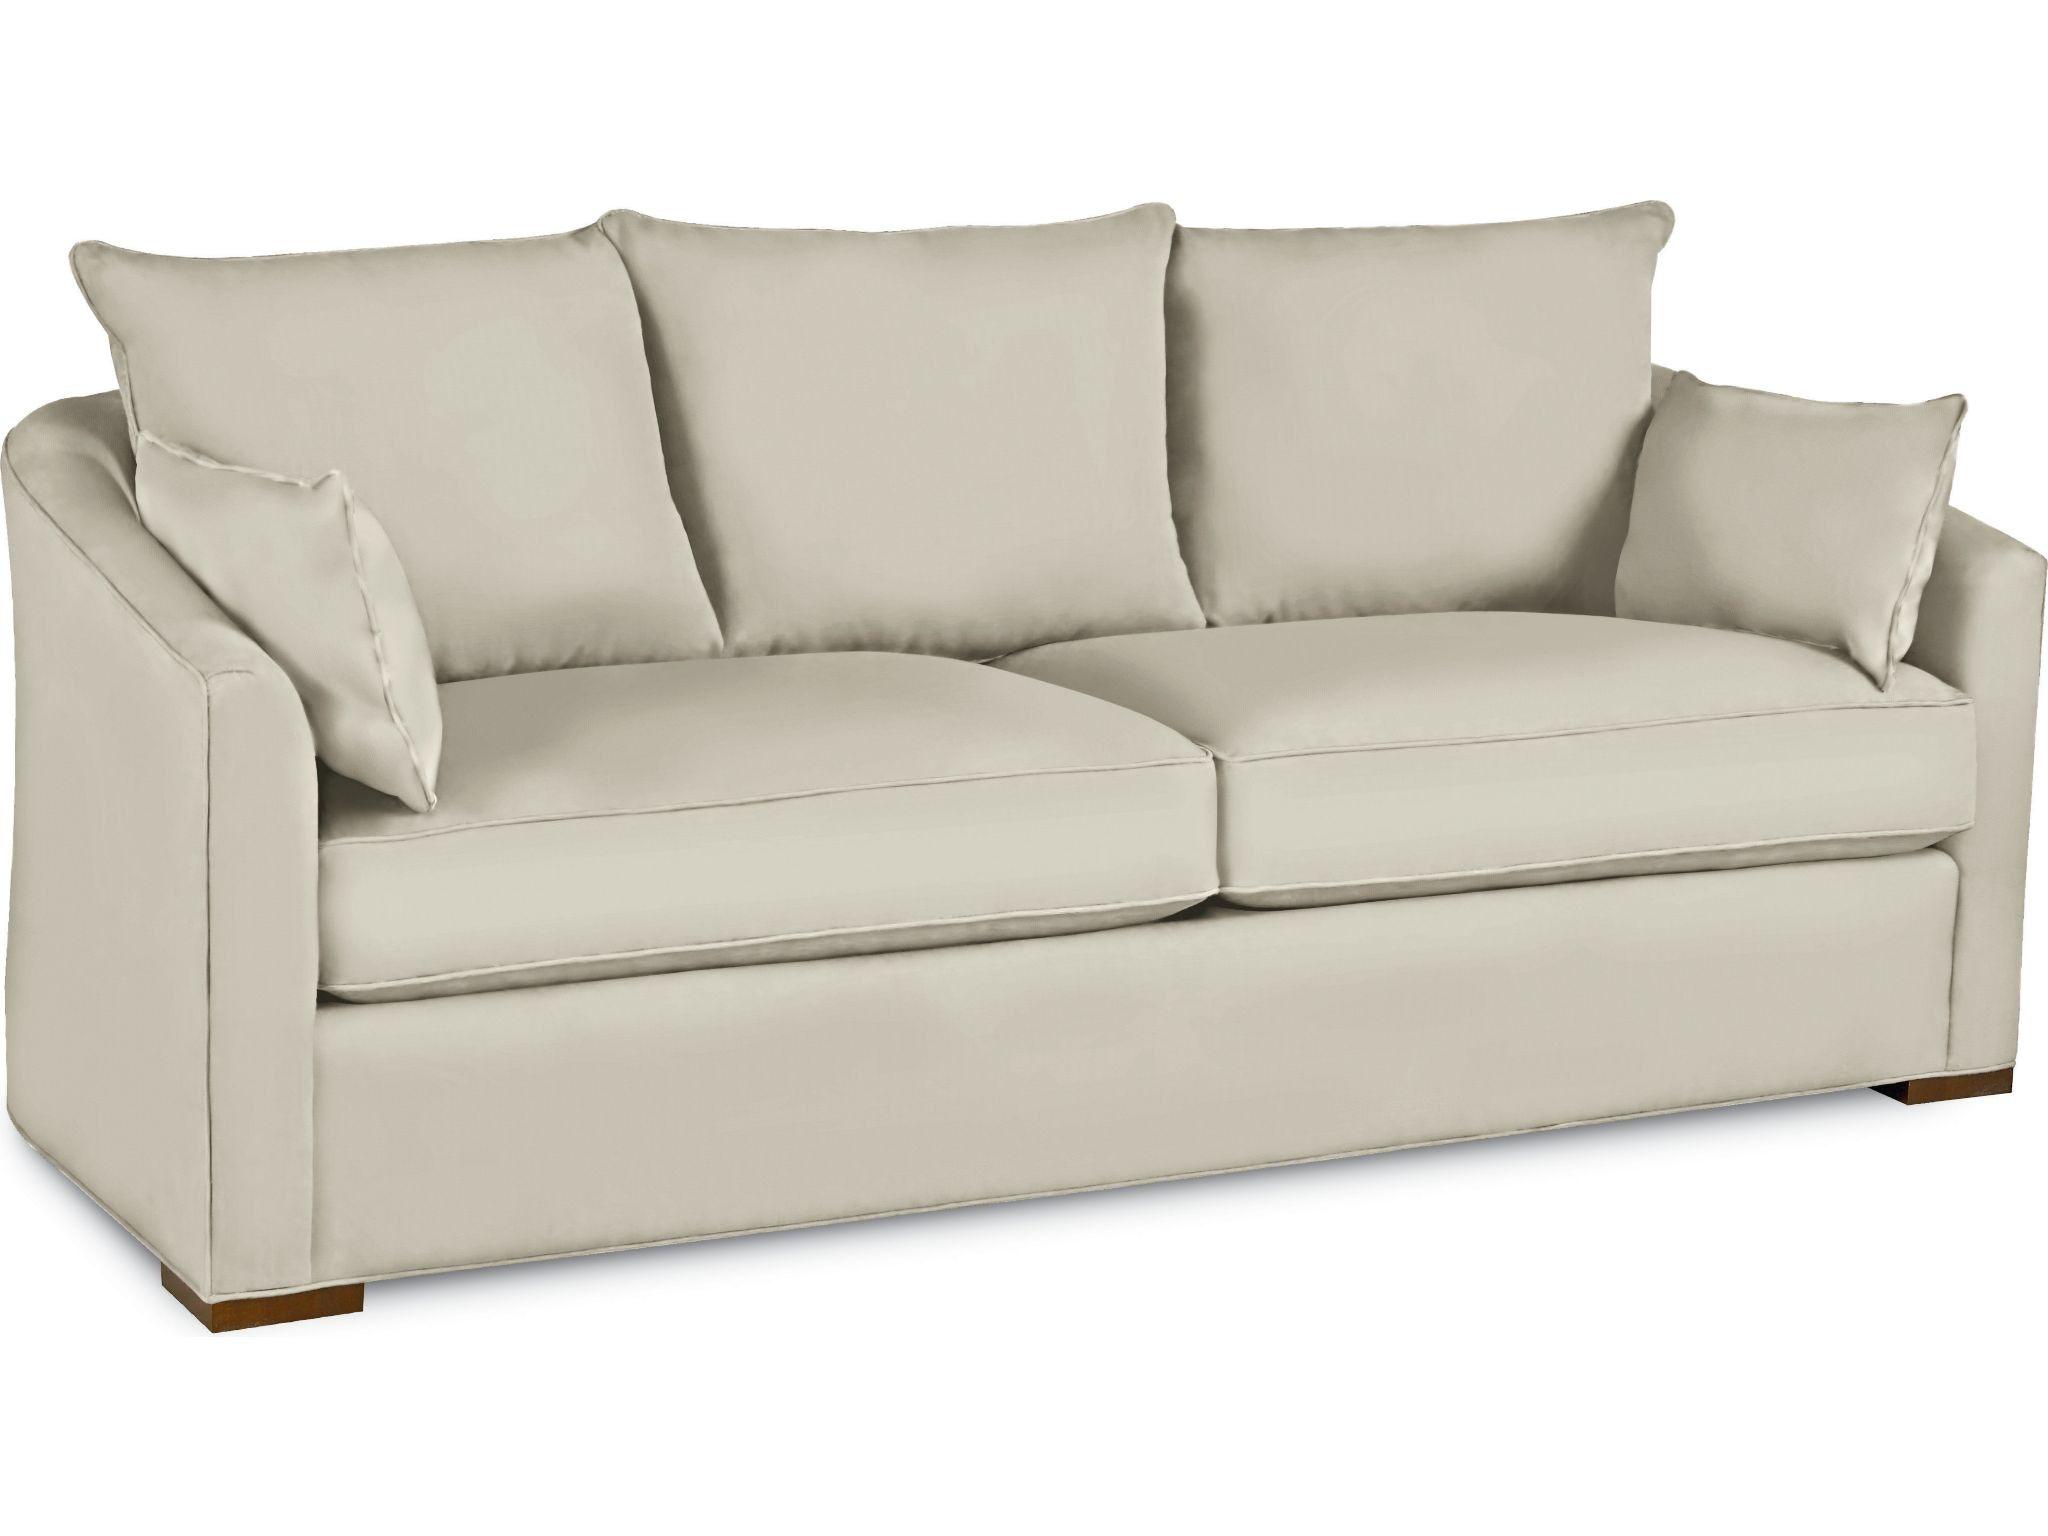 Thomasville Living Room Carina Sofa 1678 12 Kalin Home